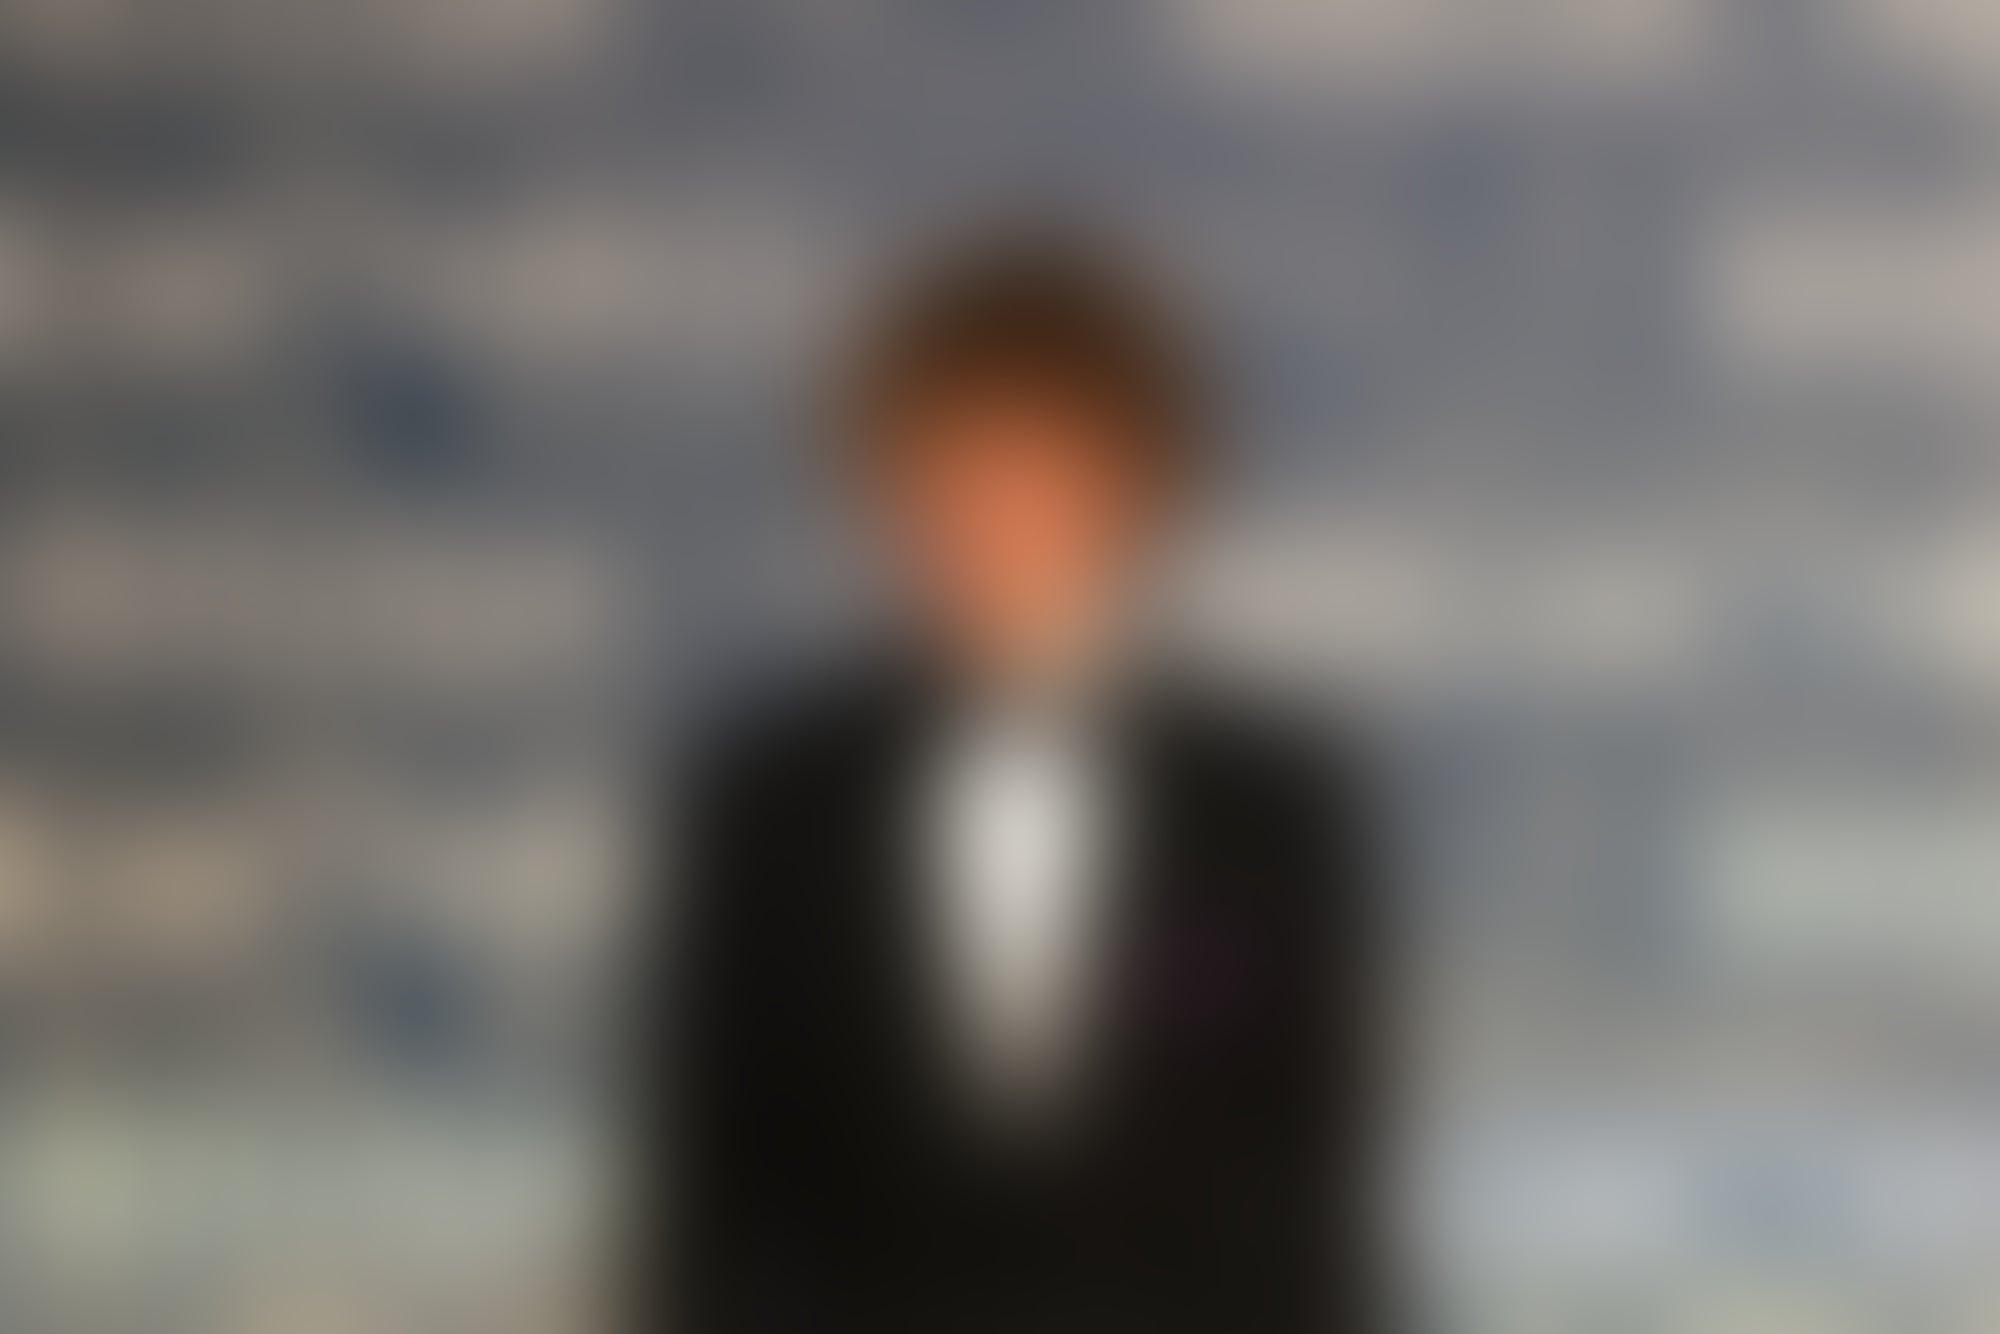 Why Mark Zuckerberg Just Gave This High School Student $400,000